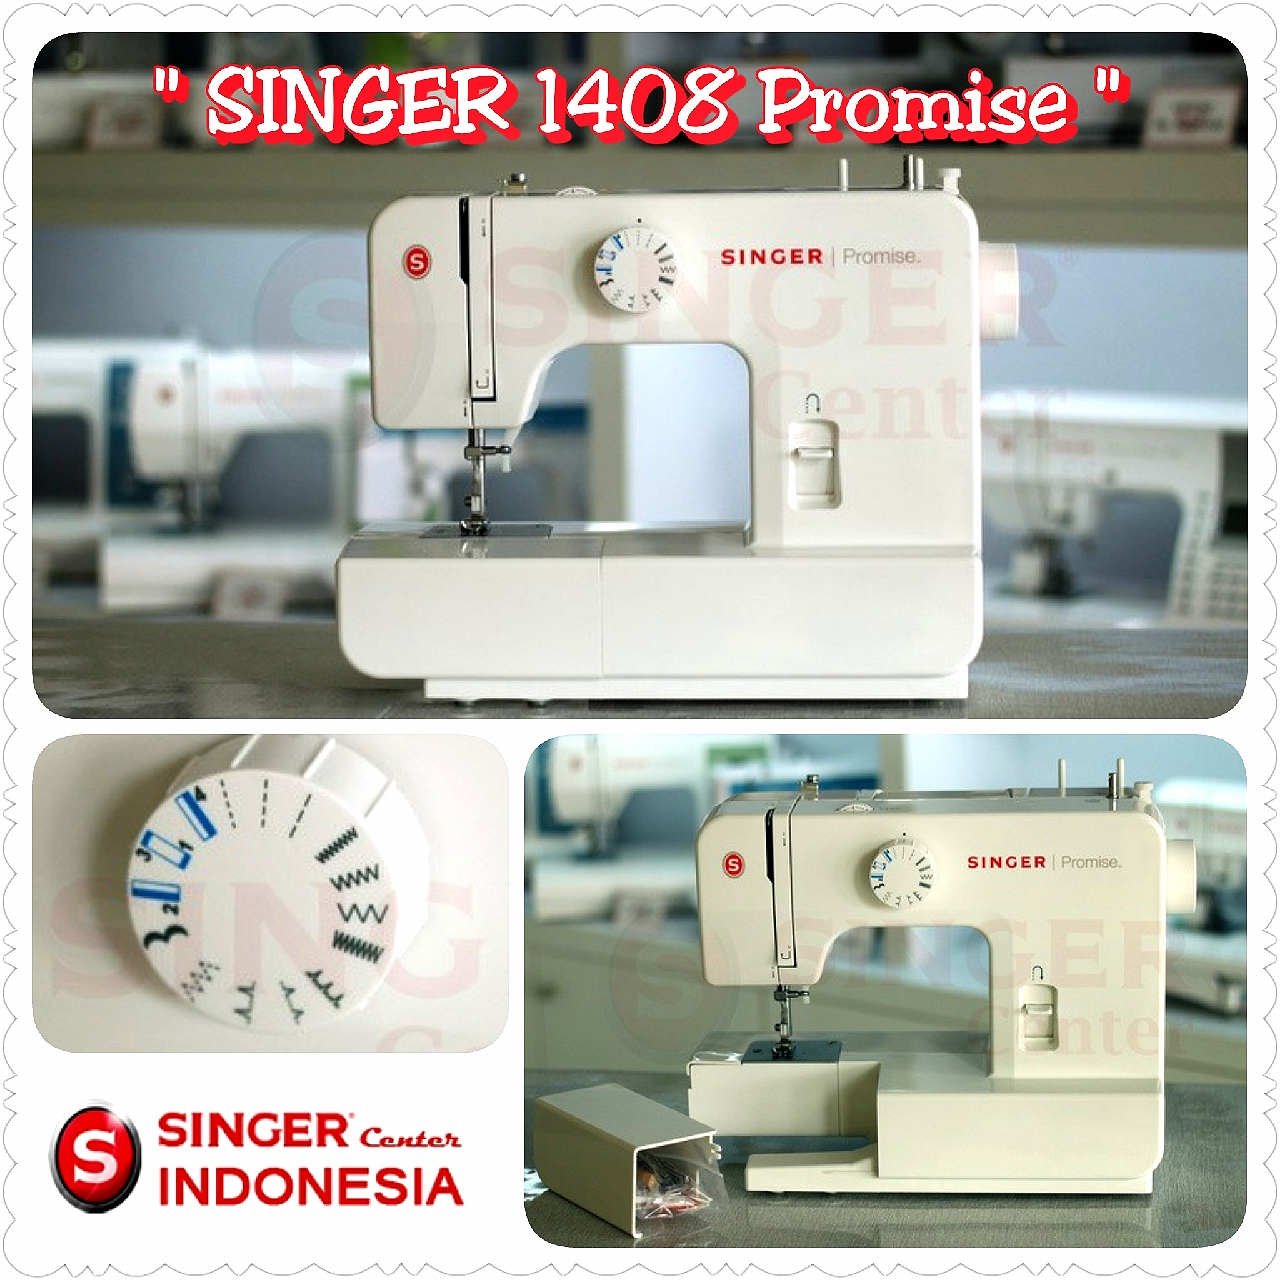 Singer 1408 Promise Mesin Jahit Daftar Harga Terlengkap Indonesia Portable Multifungsi